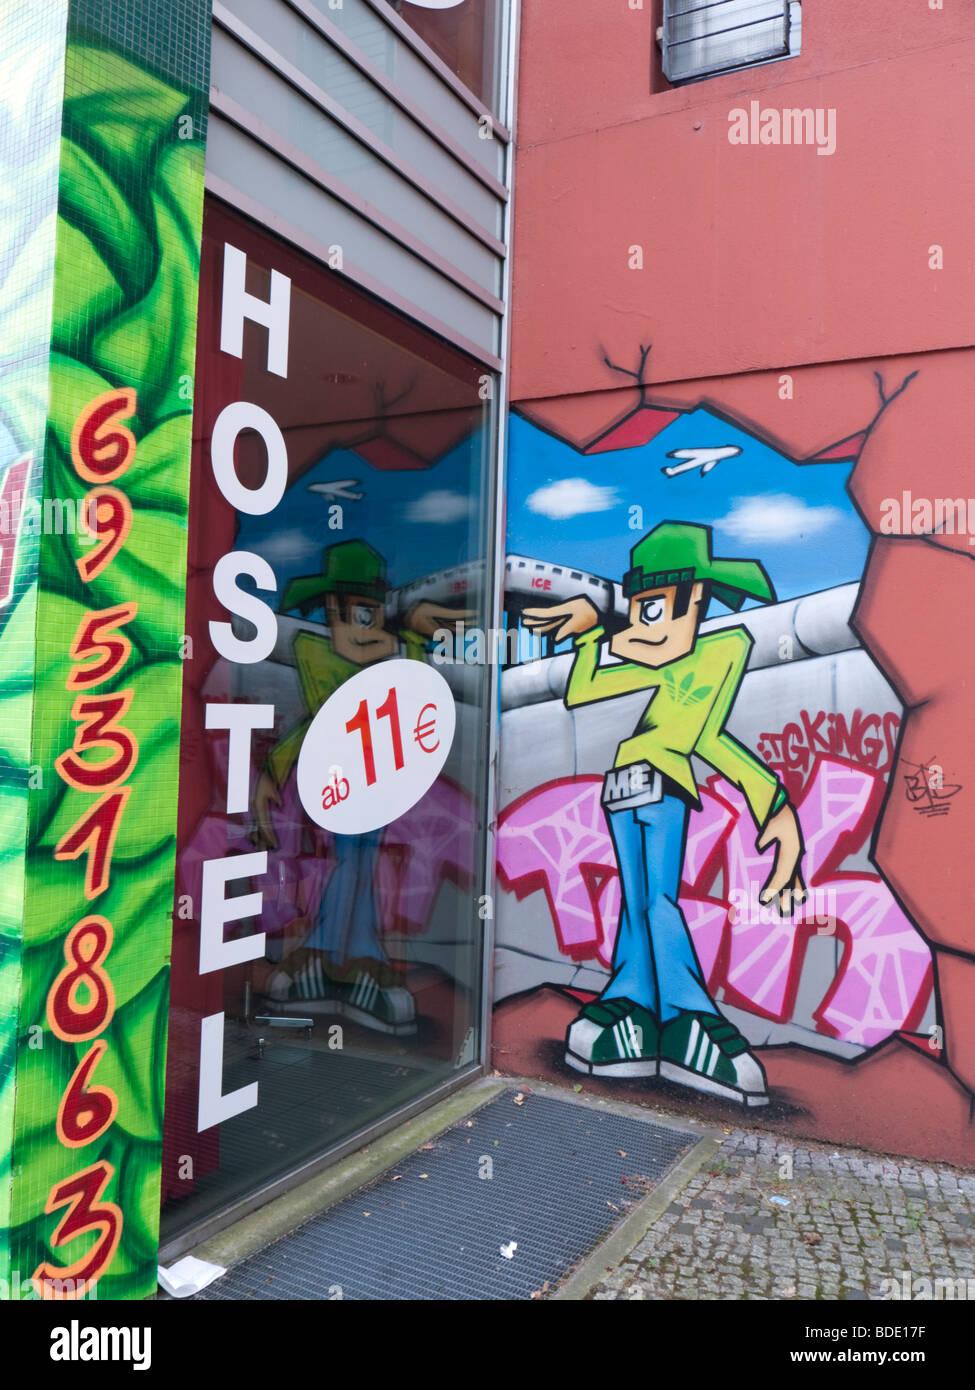 Xberger Hostel in Kreuzberg is one of an increasing number of low cost hostels in Berlin Germany - Stock Image